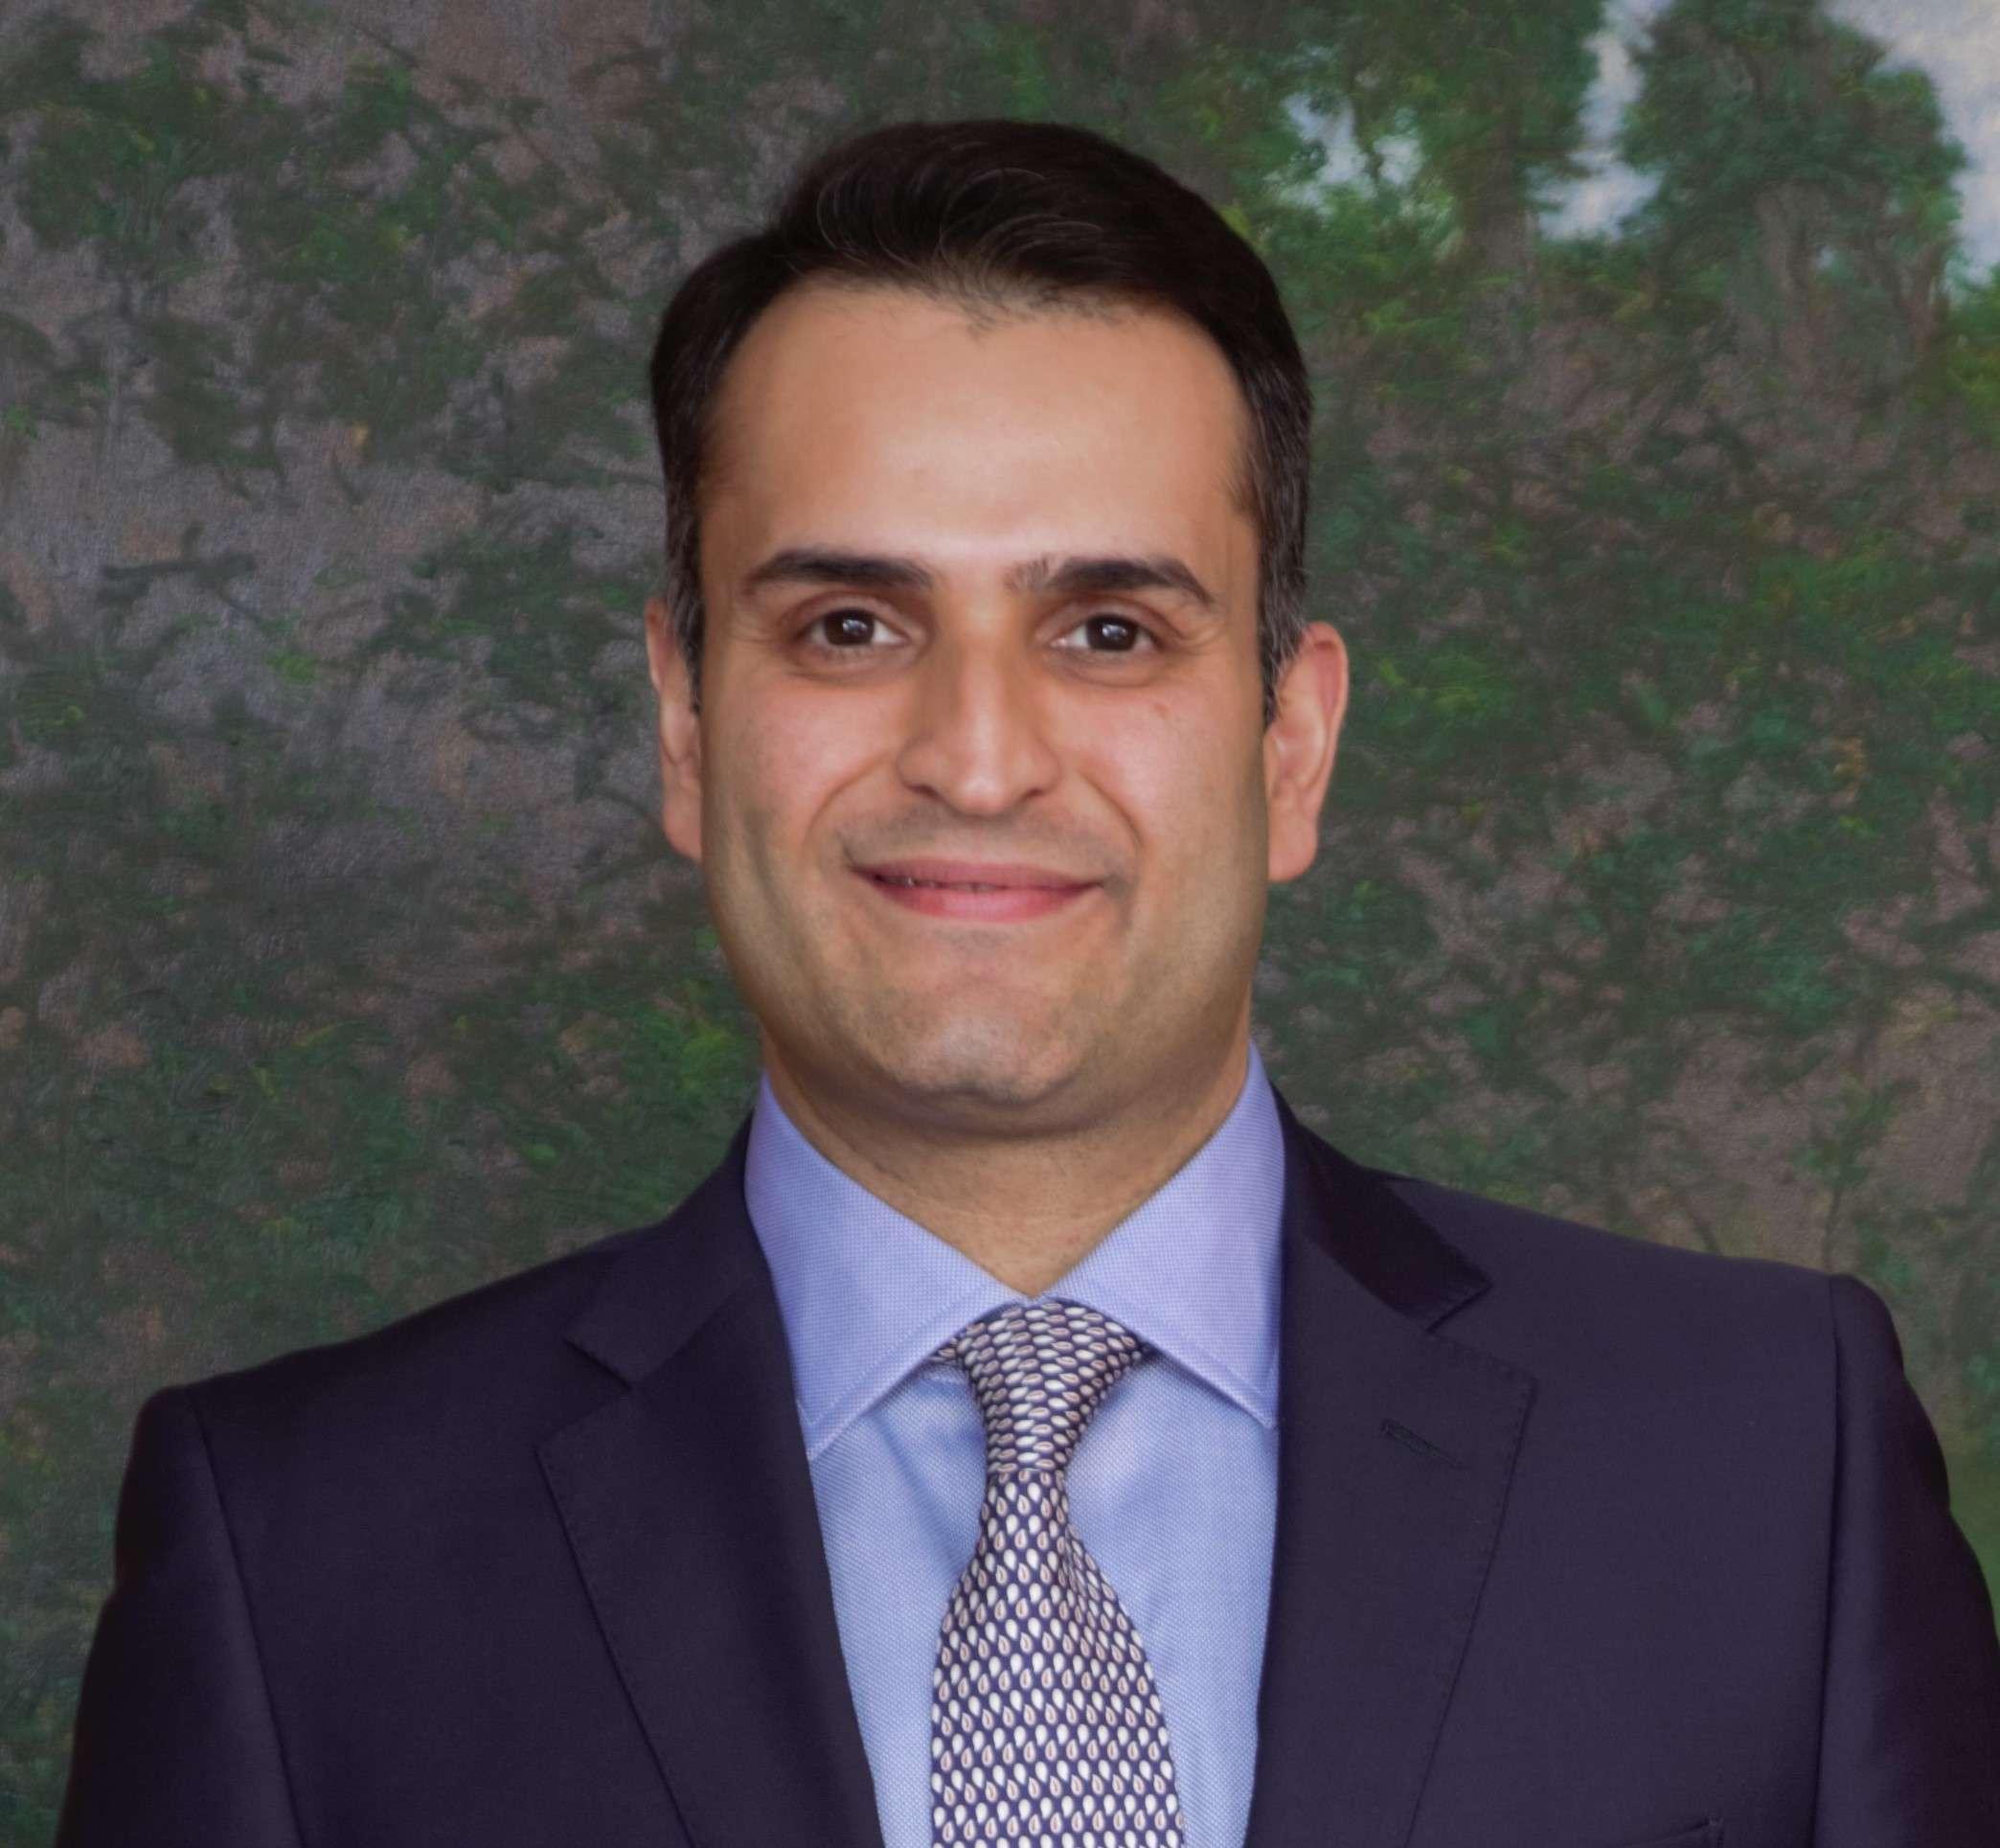 Mr Anshuman Singhania, Chairman ATMA